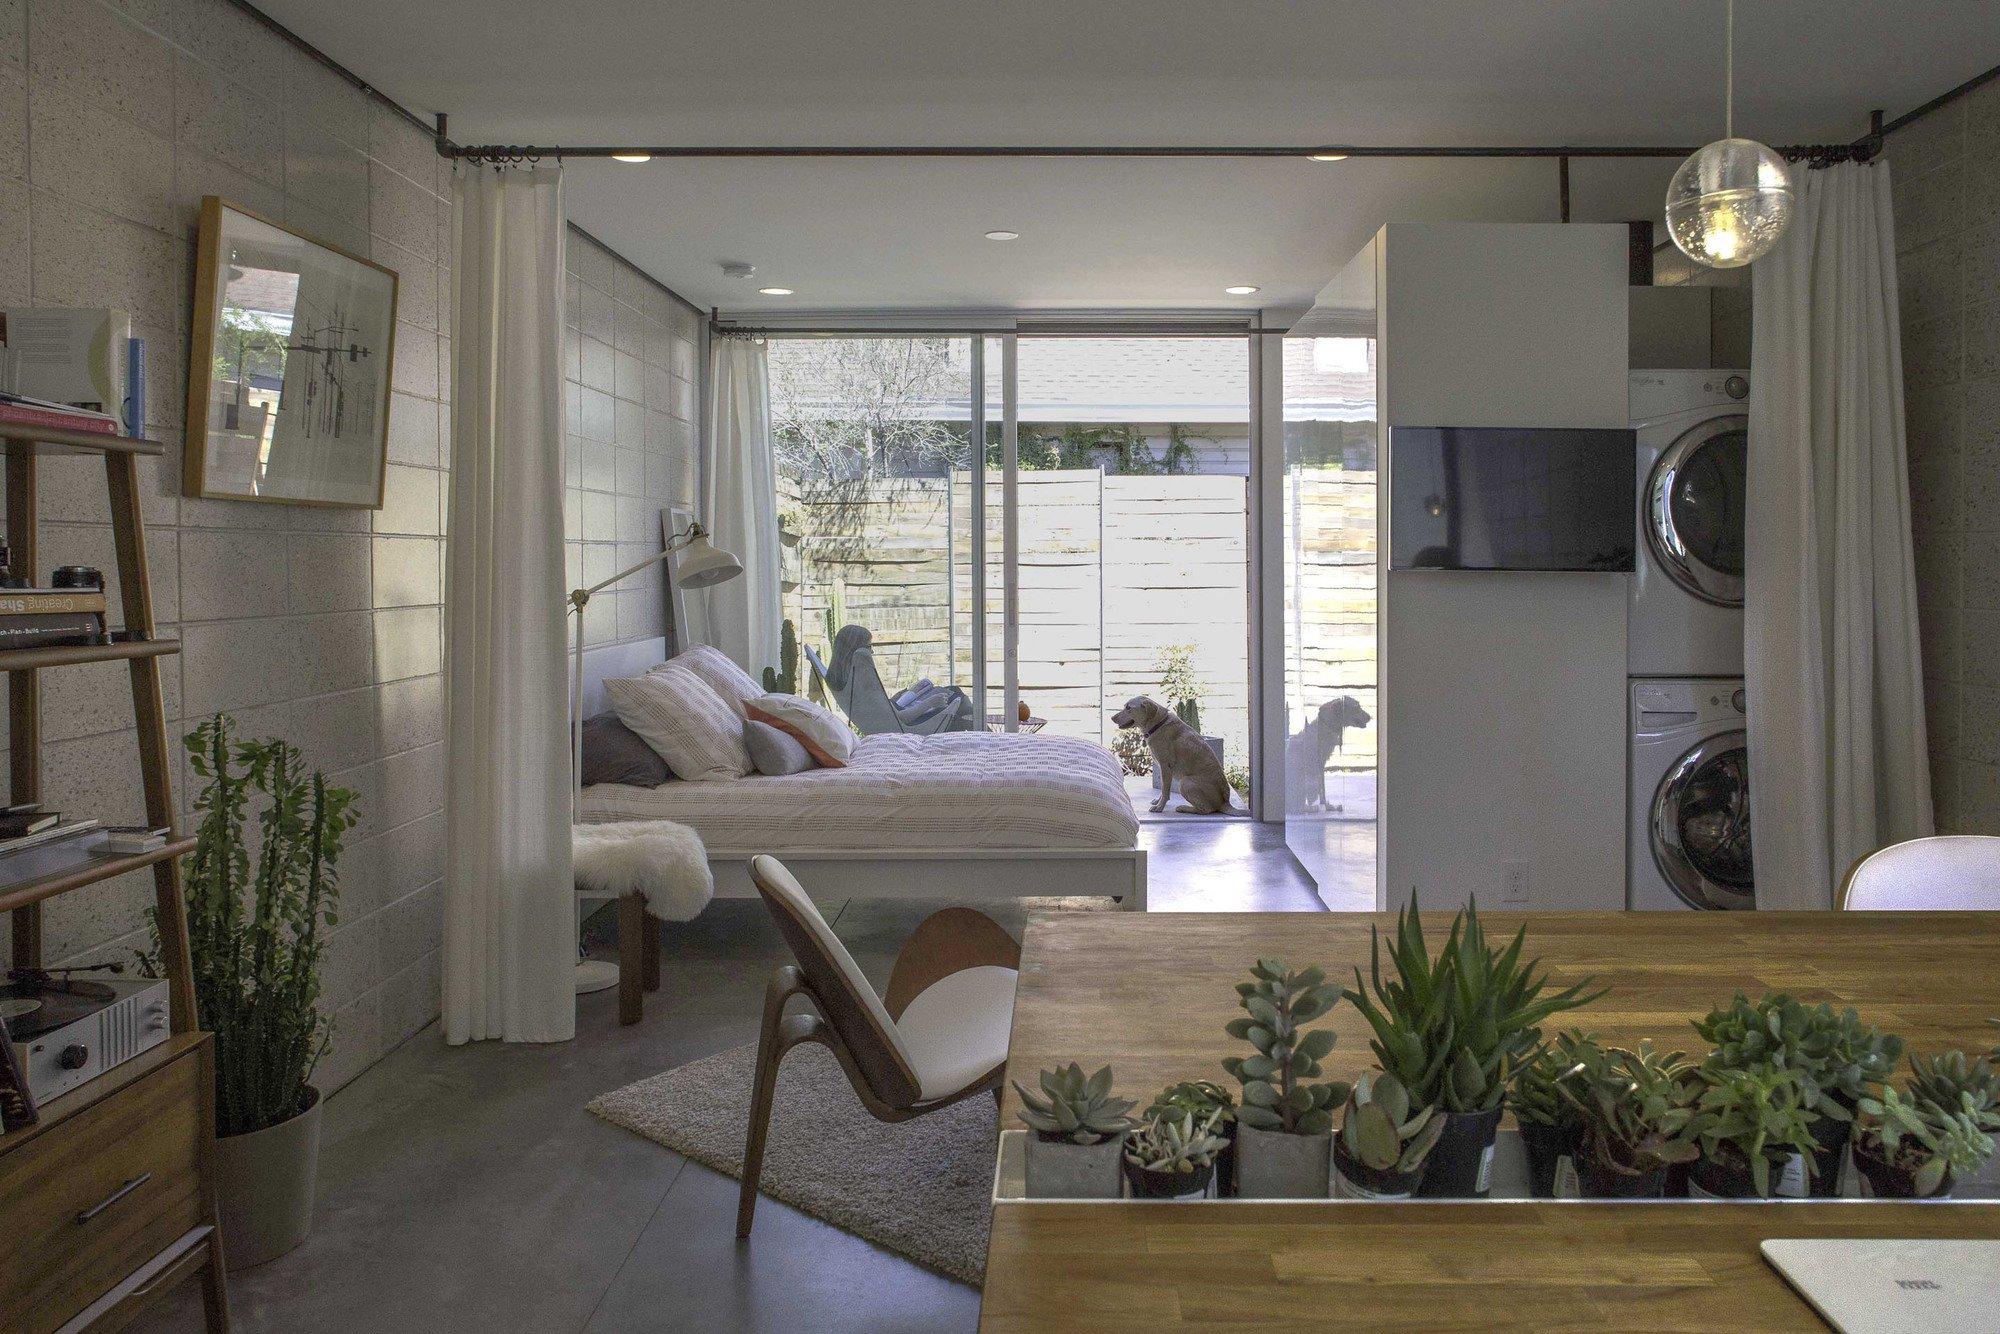 White Stone Studios minimalist apartment